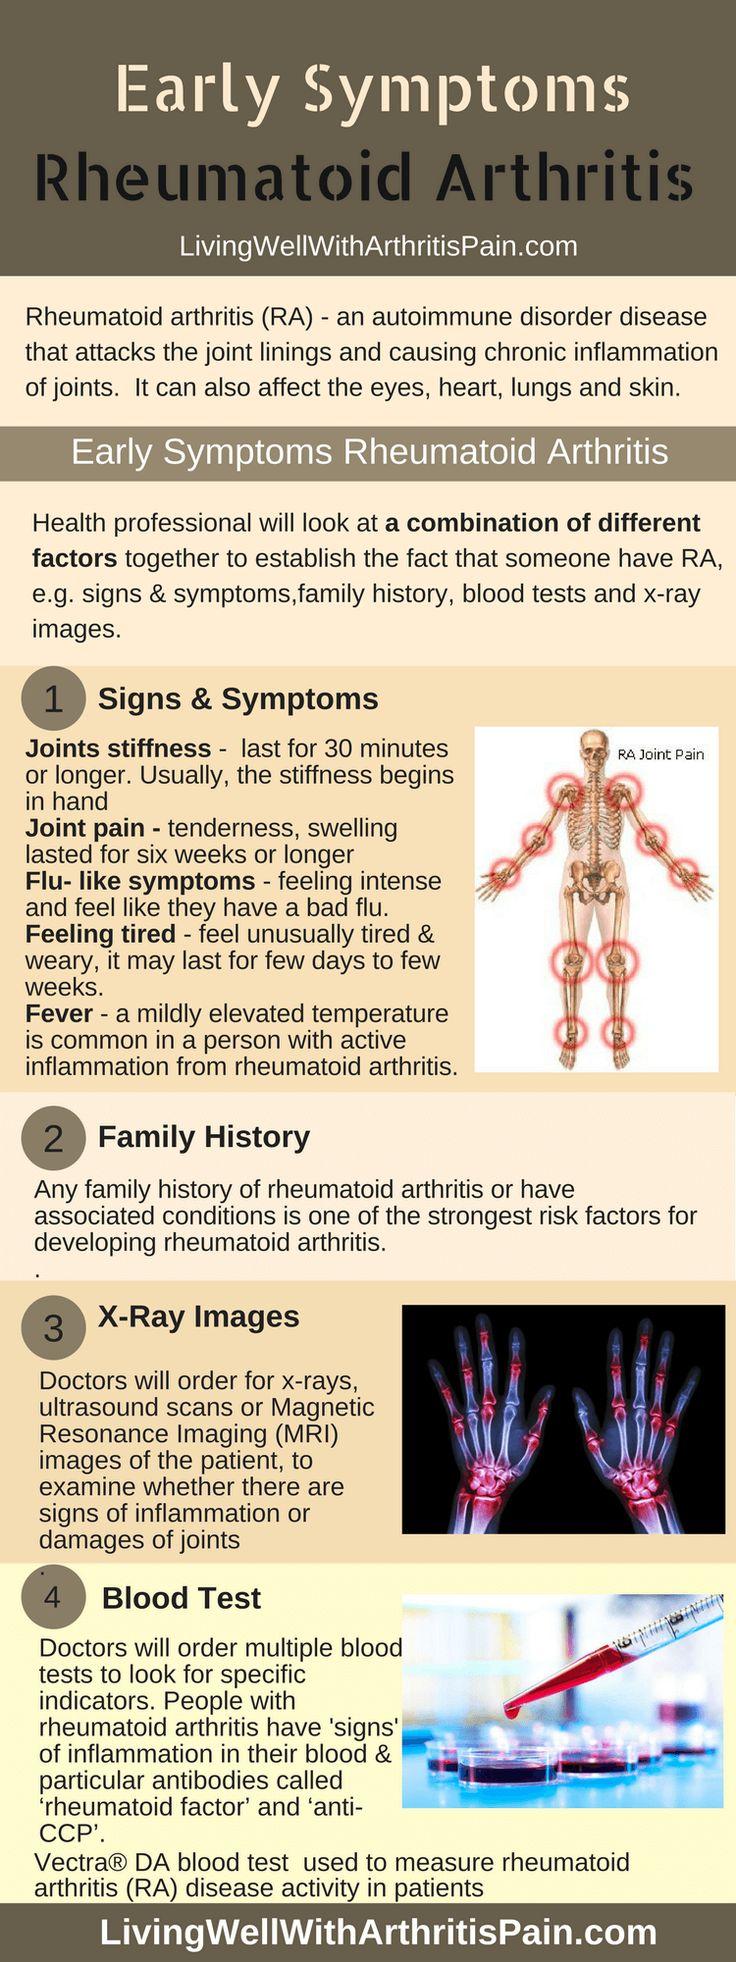 A combination of Early Symptoms Rheumatoid Arthritis